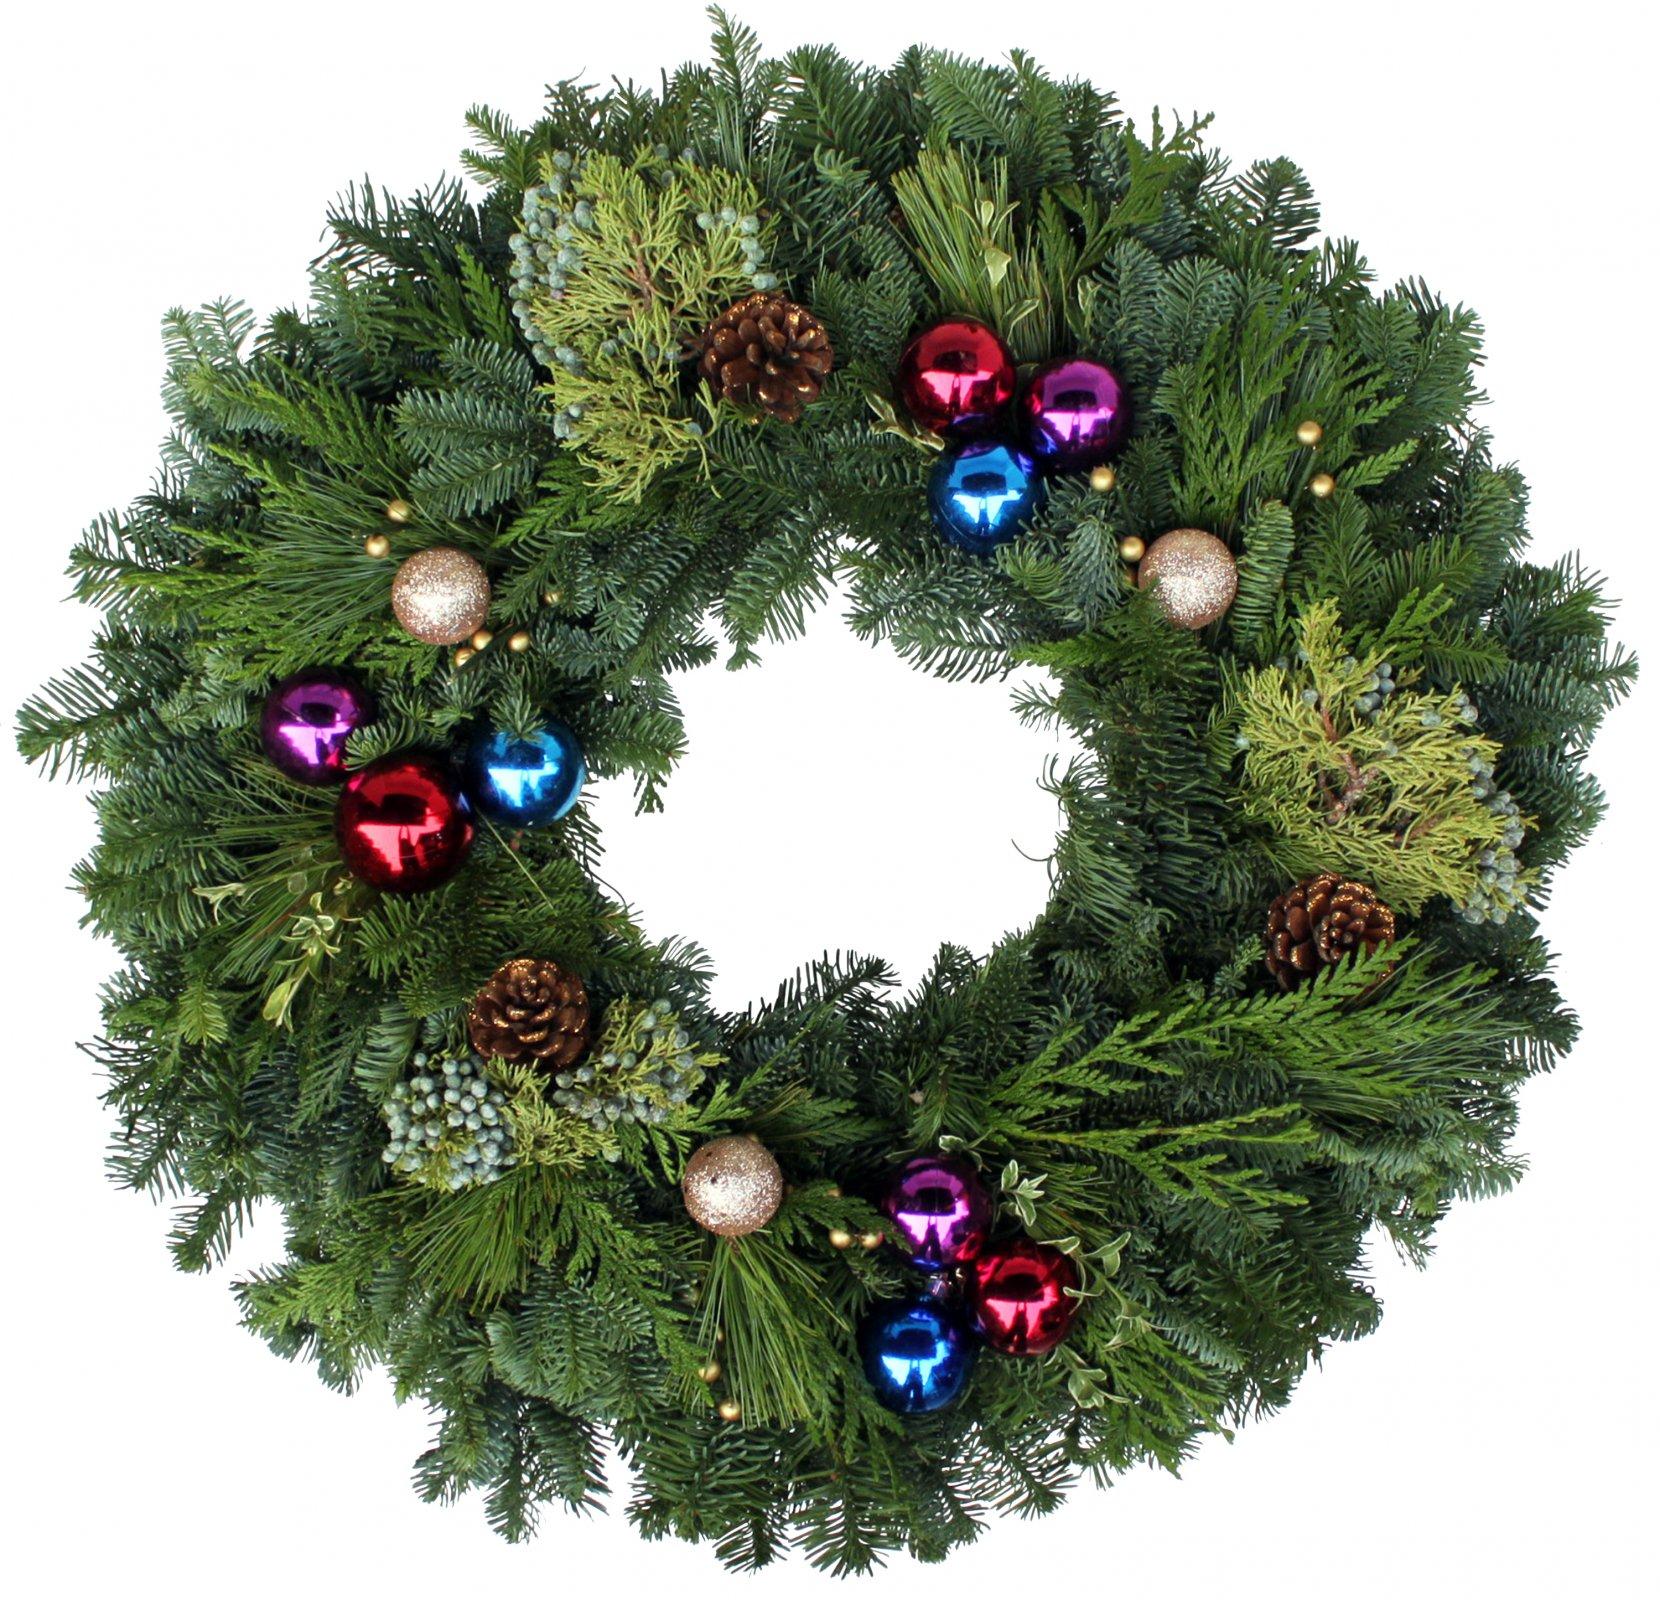 24 Festive Design Wreath